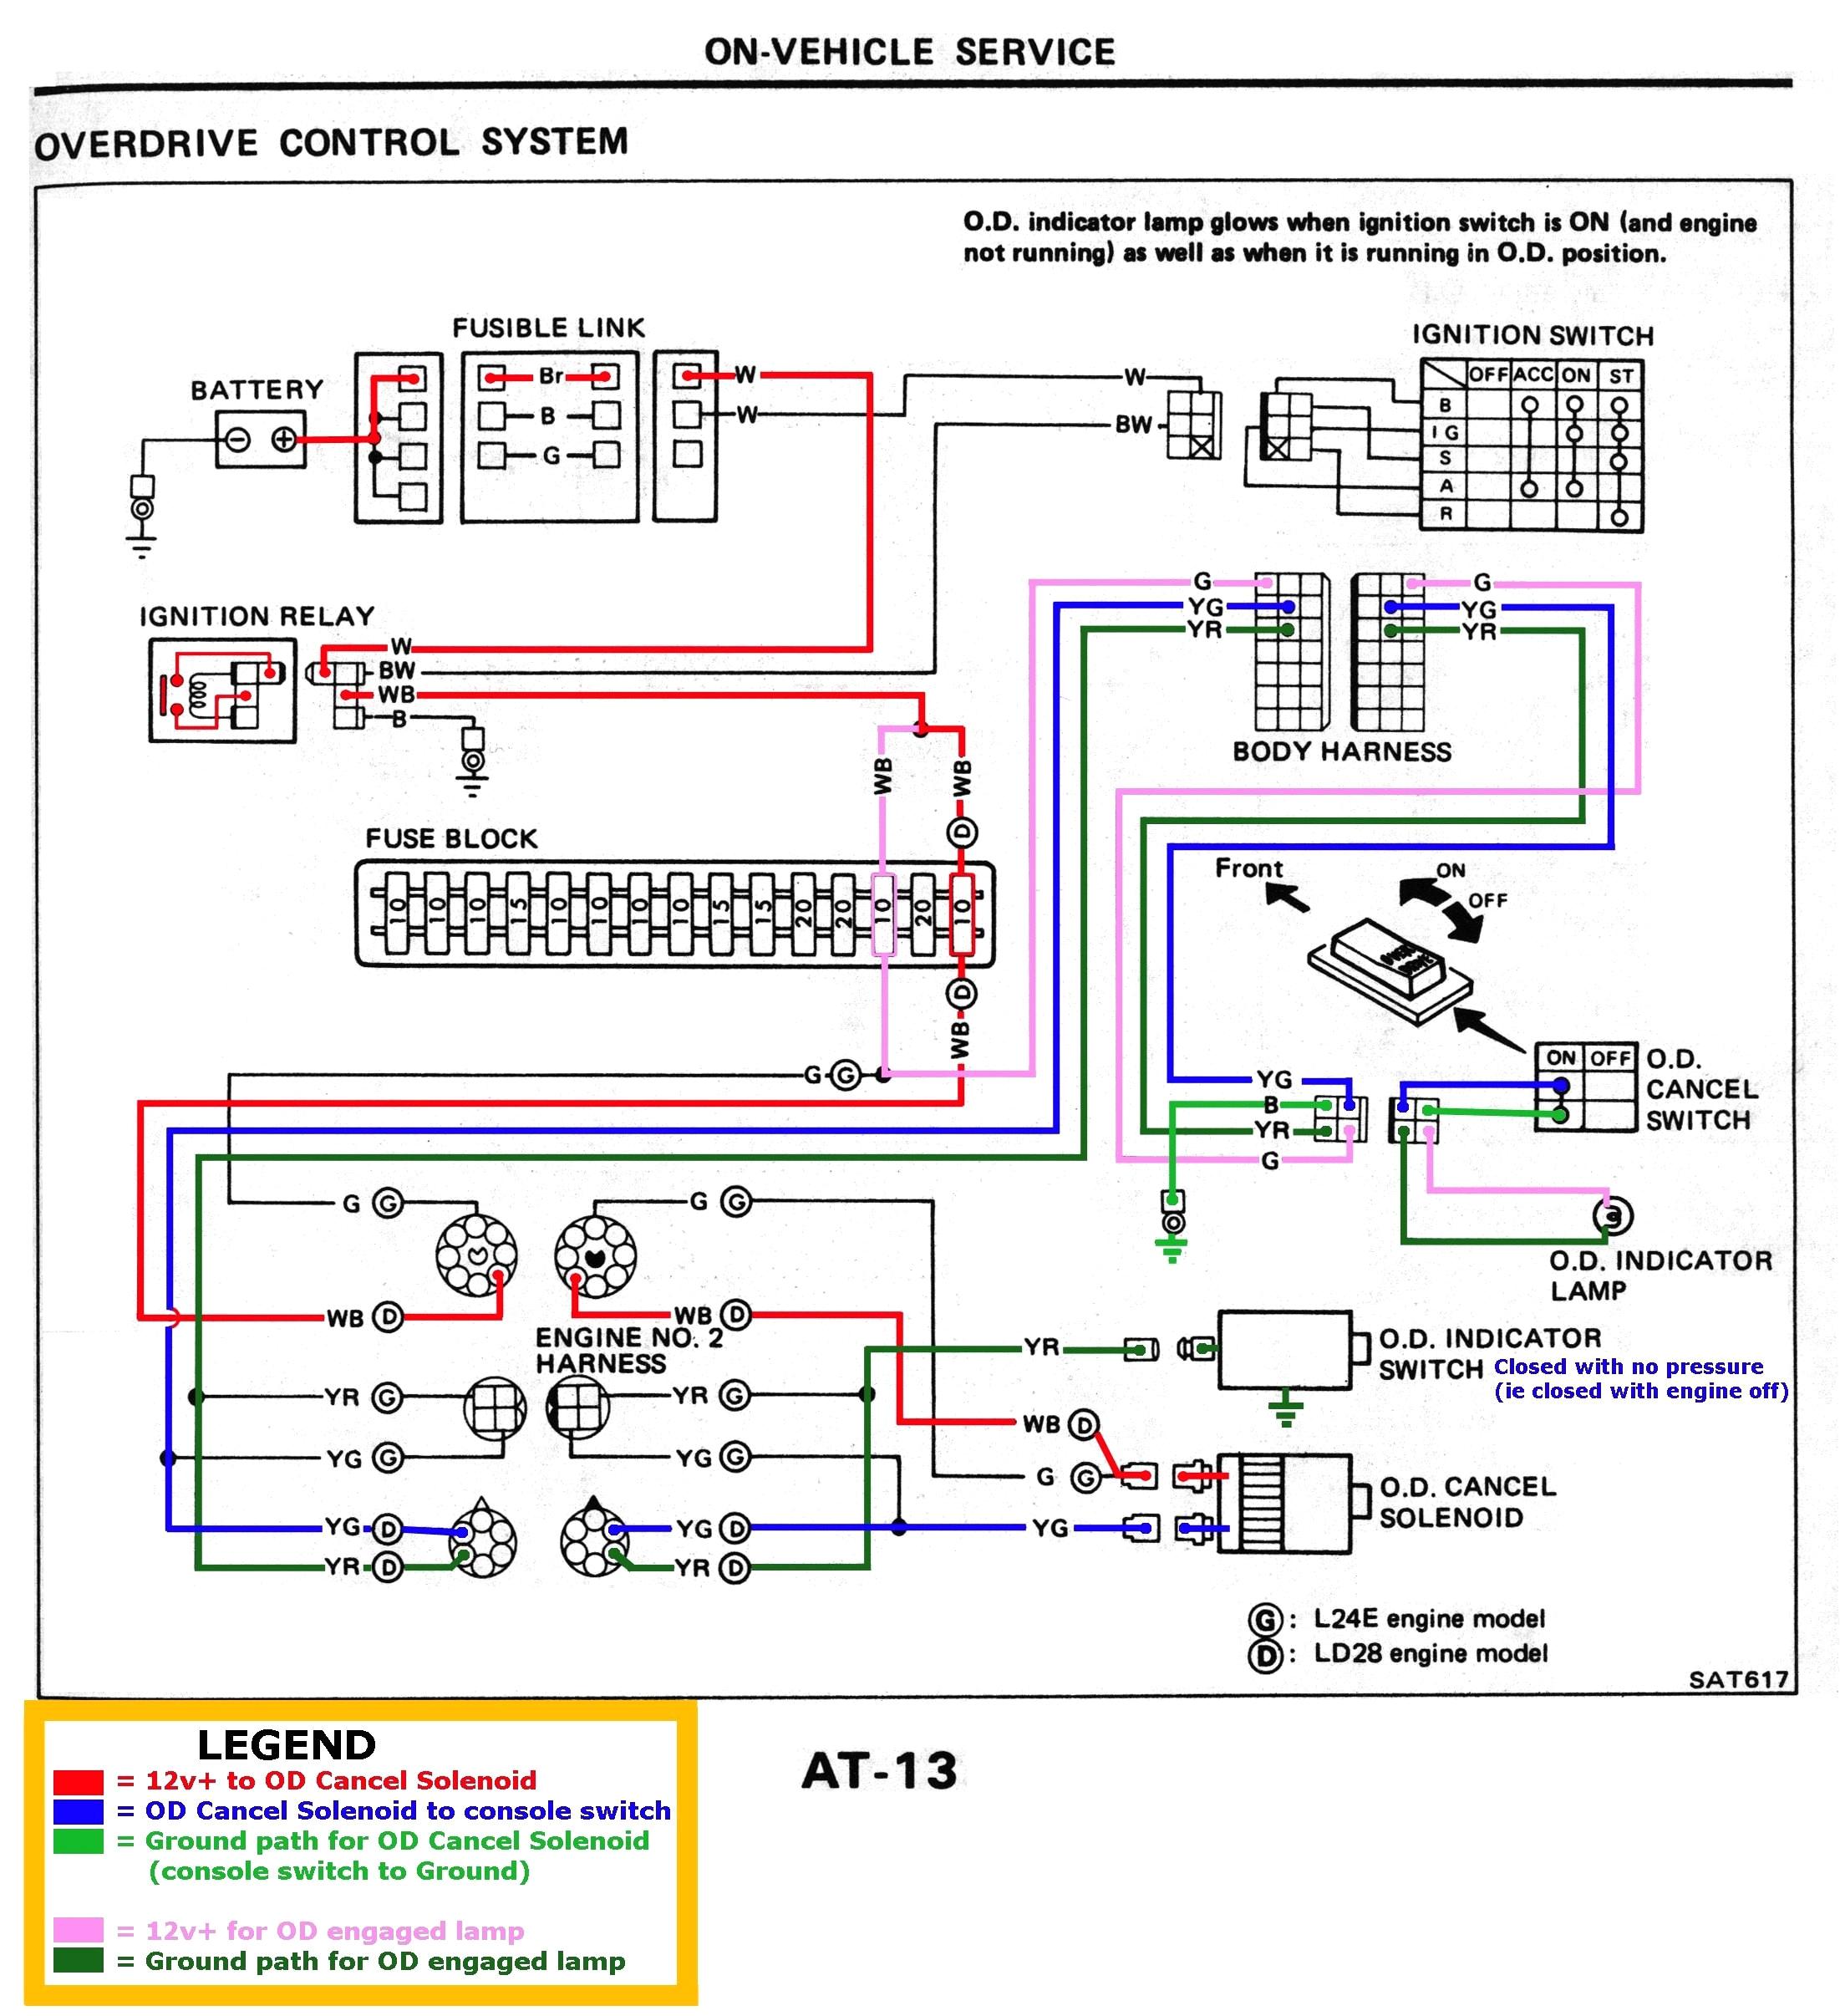 2007 toyota tundra wiring diagram split unit wiring diagram of 2007 toyota tundra wiring diagram 2018